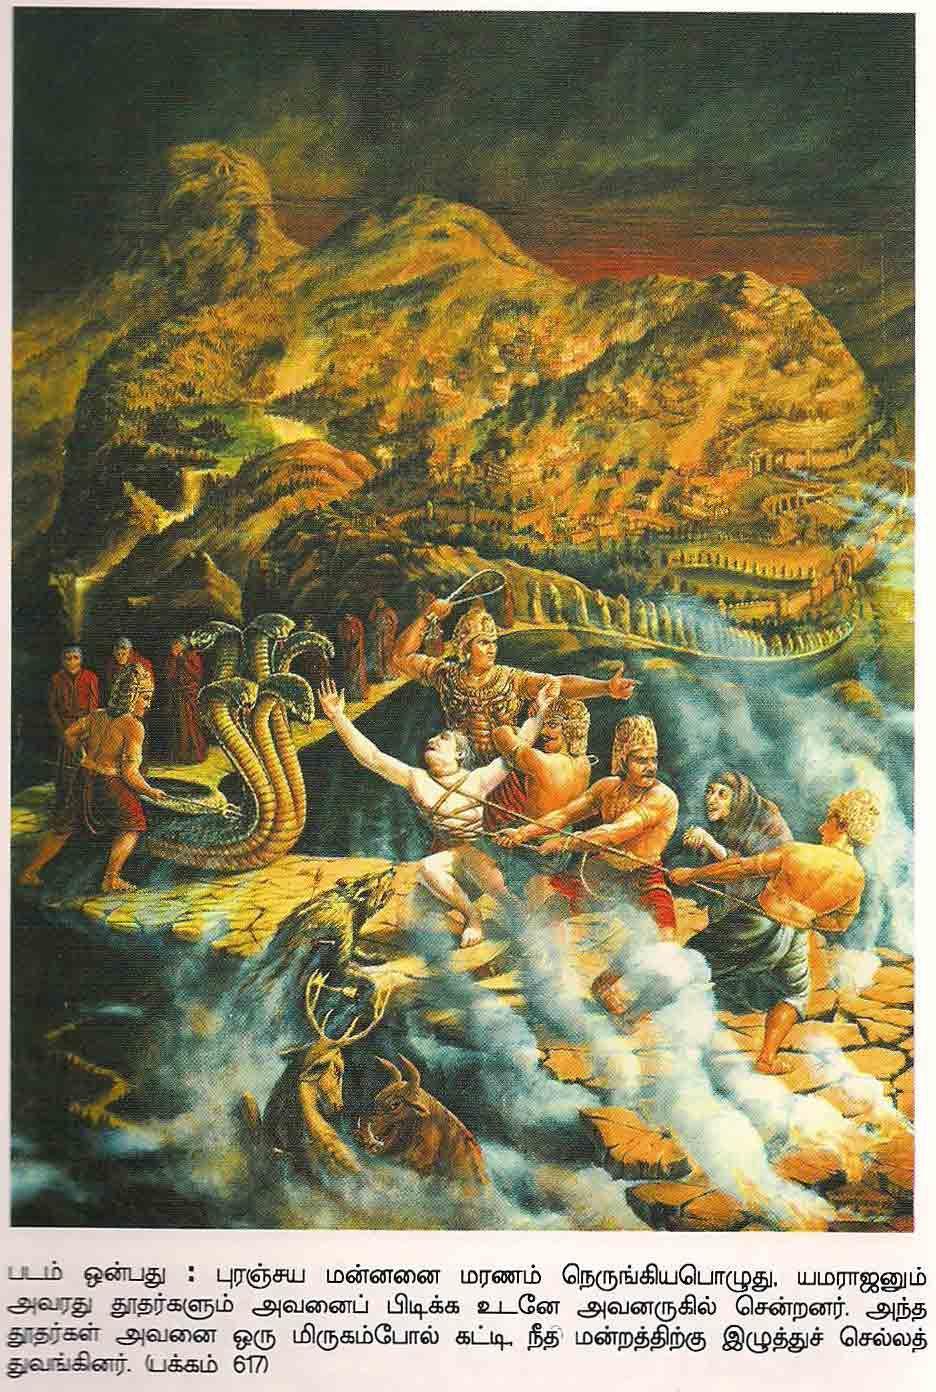 PURANJAYA_KING_RIPPED_TOWARDS_HELL